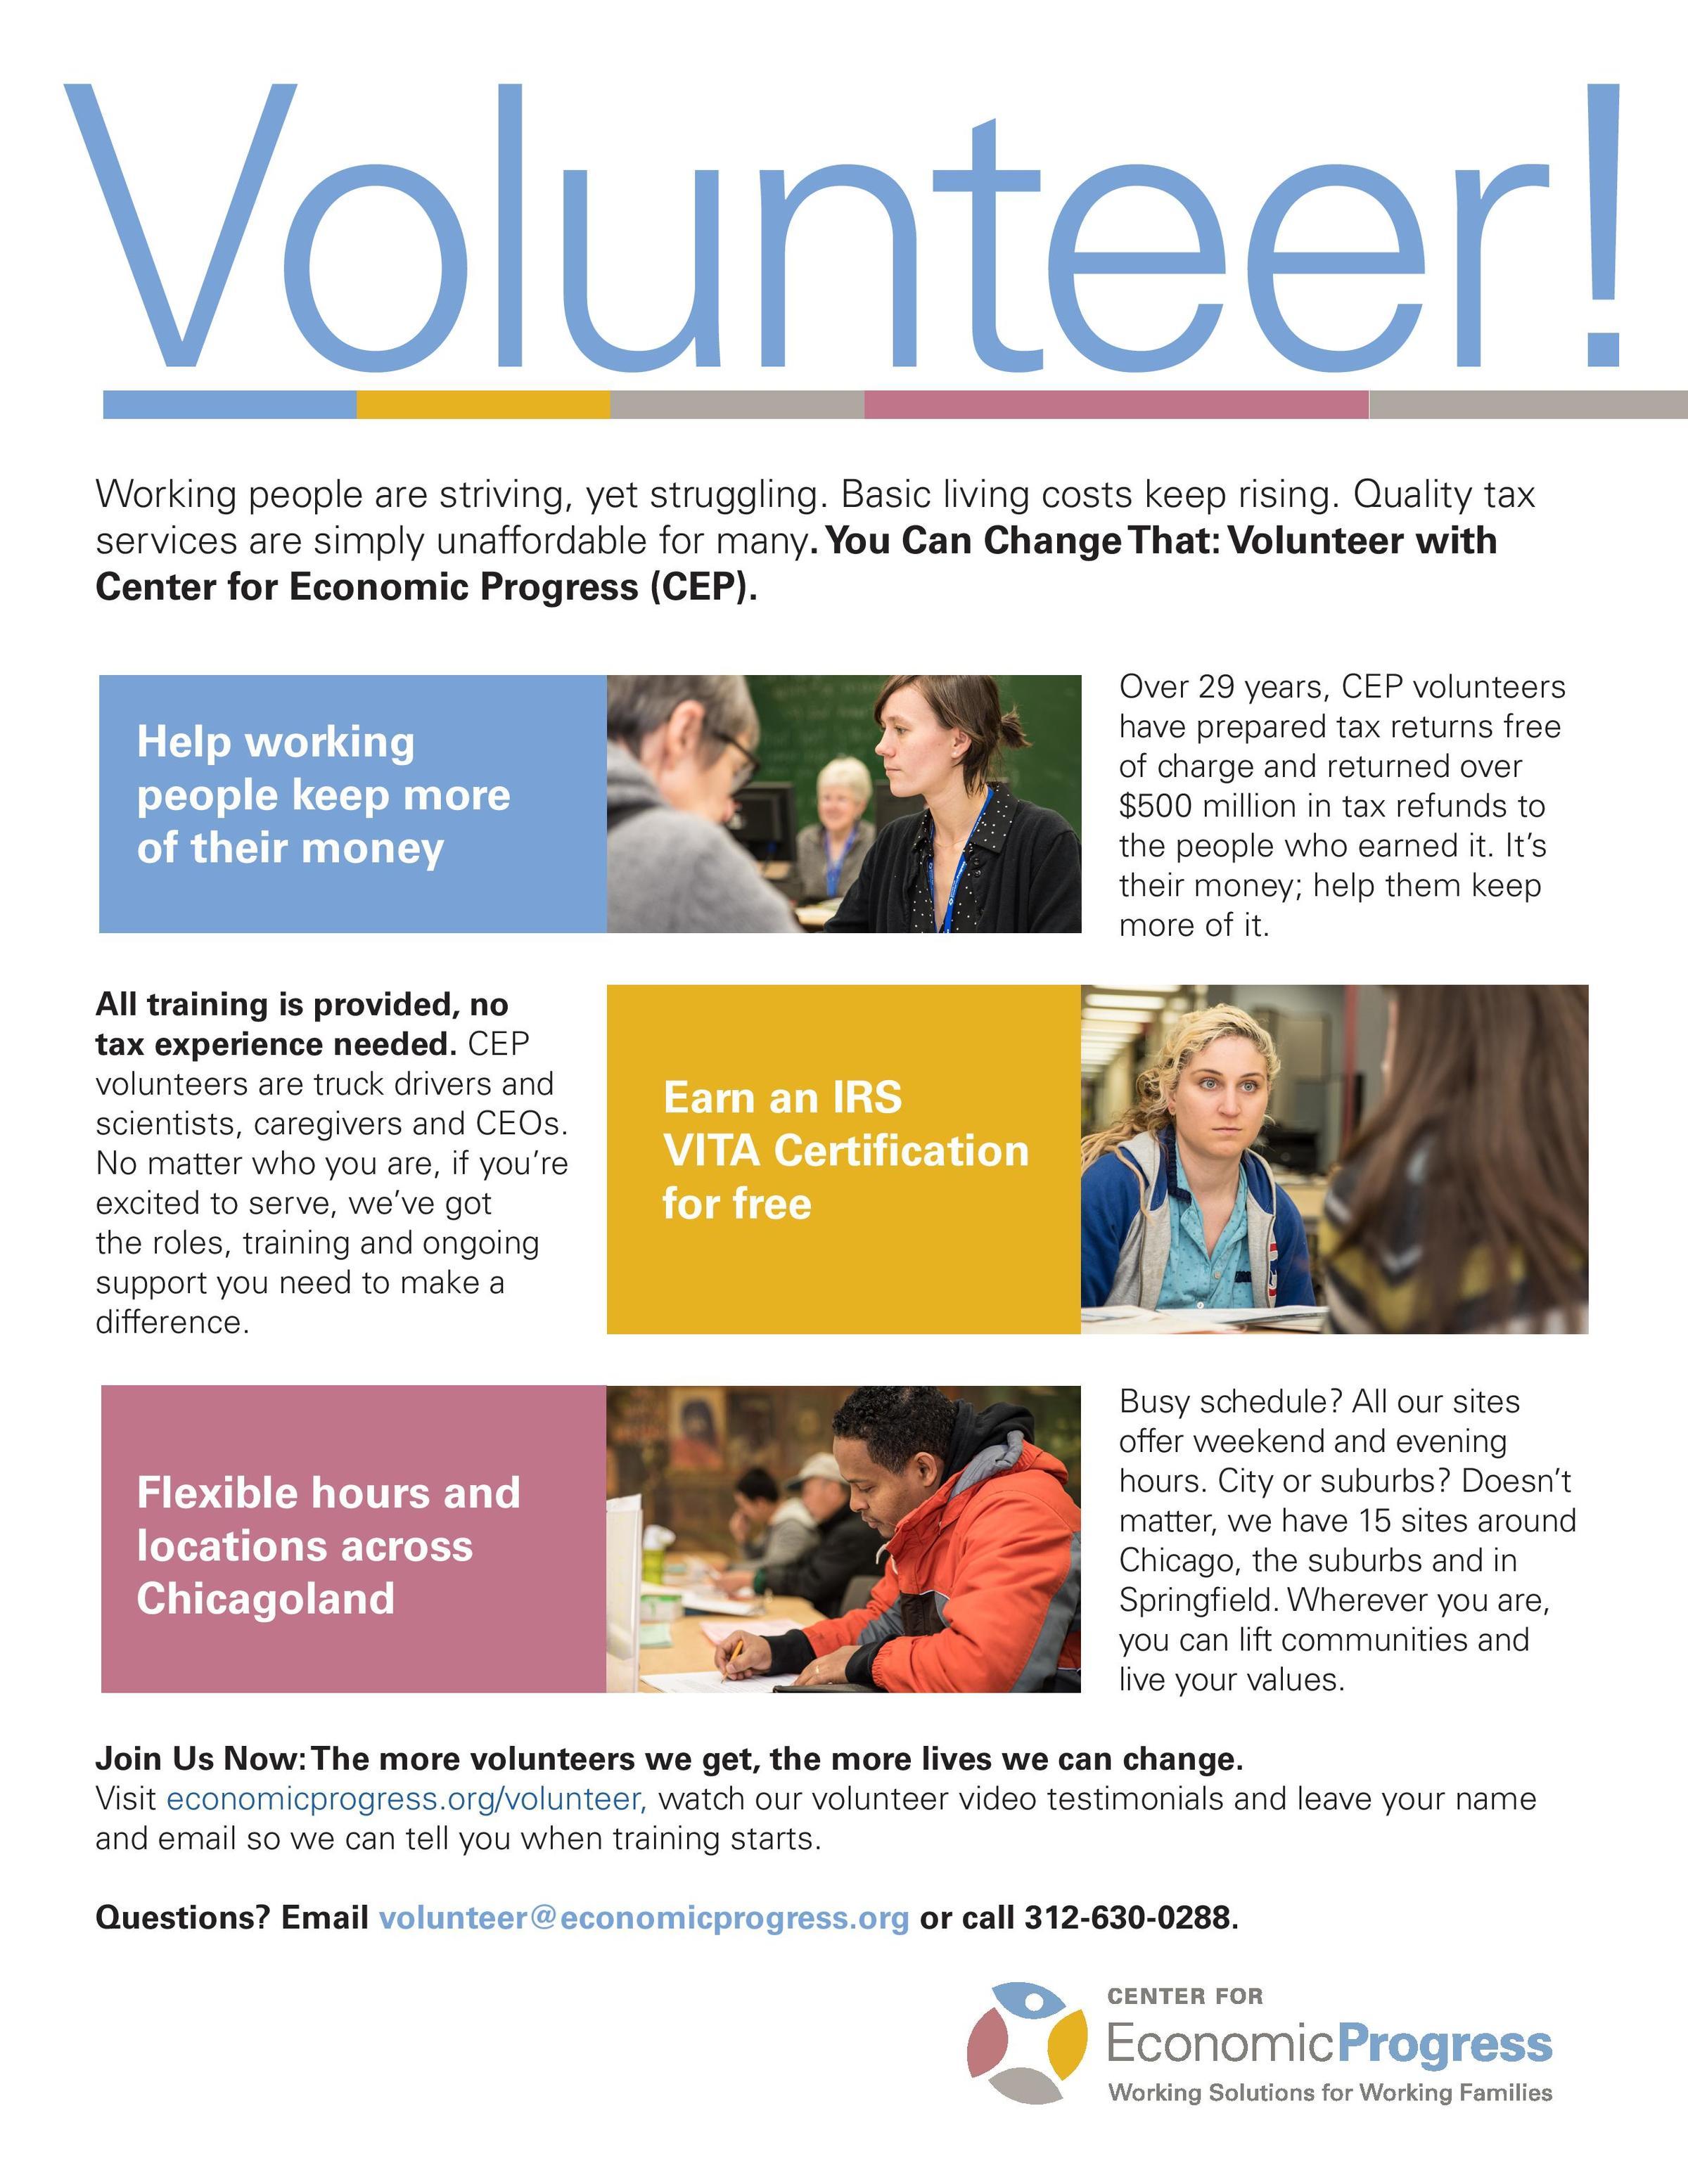 Volunteer With The Center For Economic Progress Cep Uic